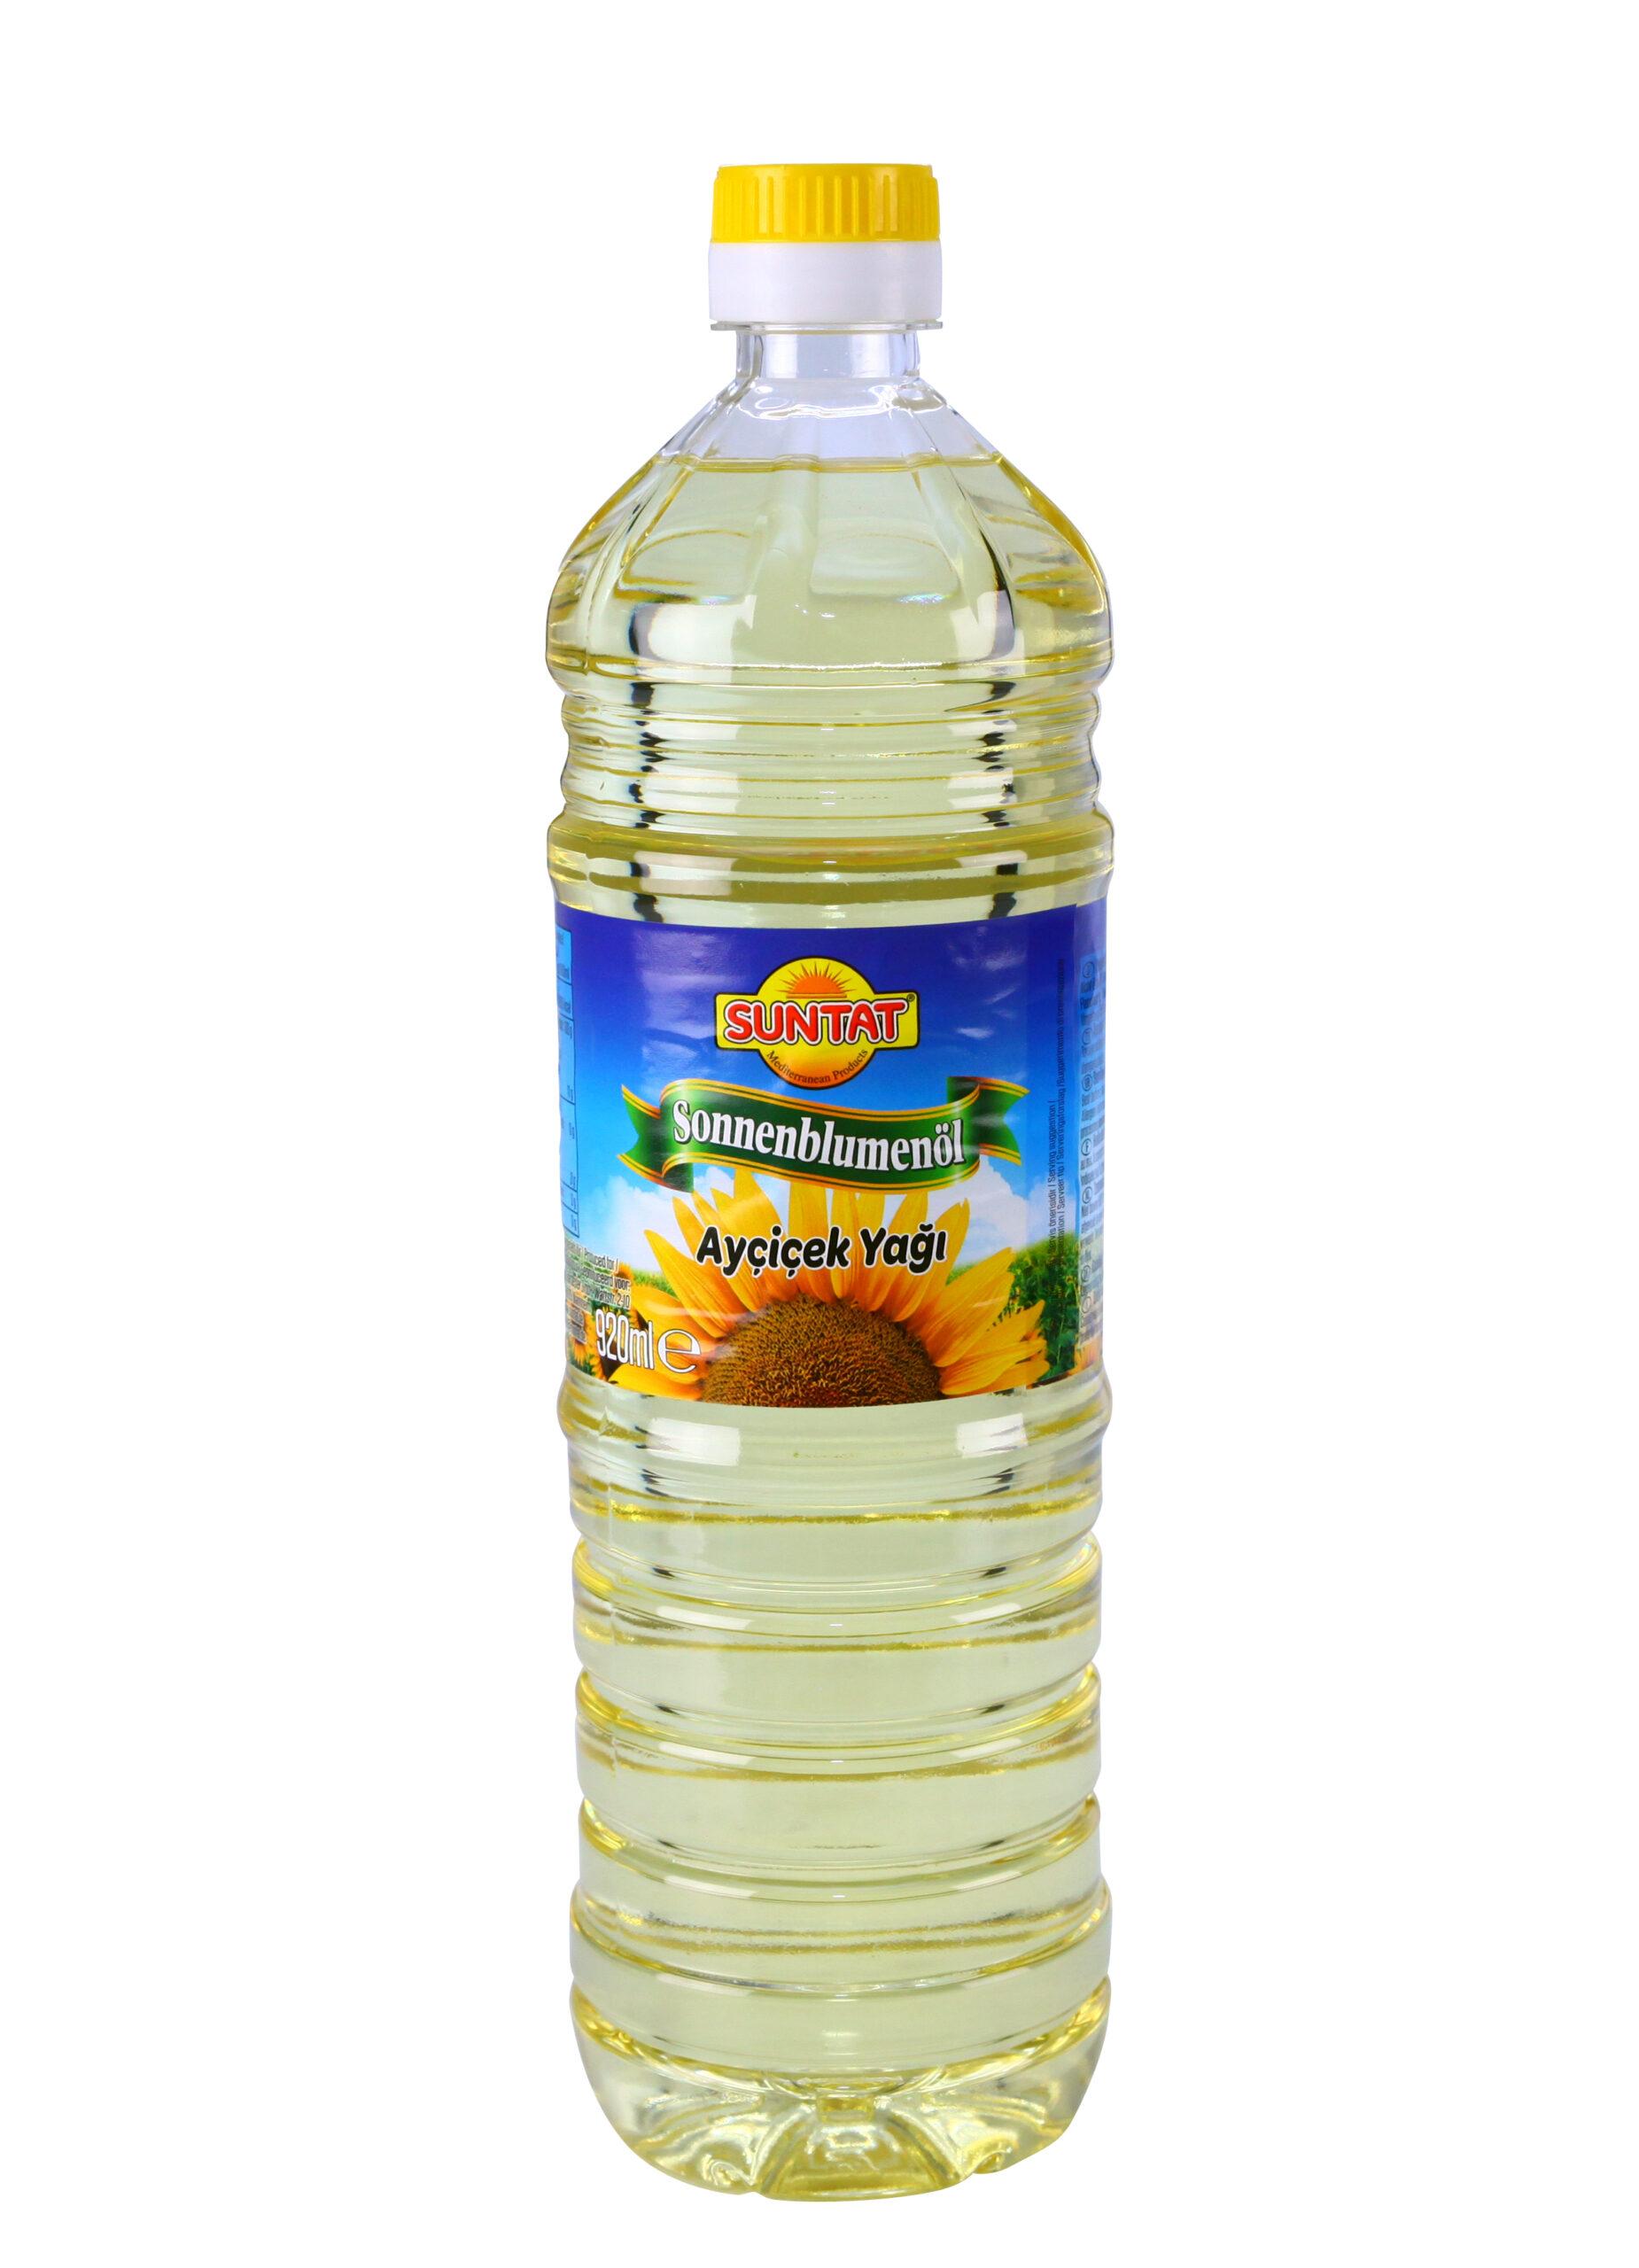 Suntat Sonnenblumenöl